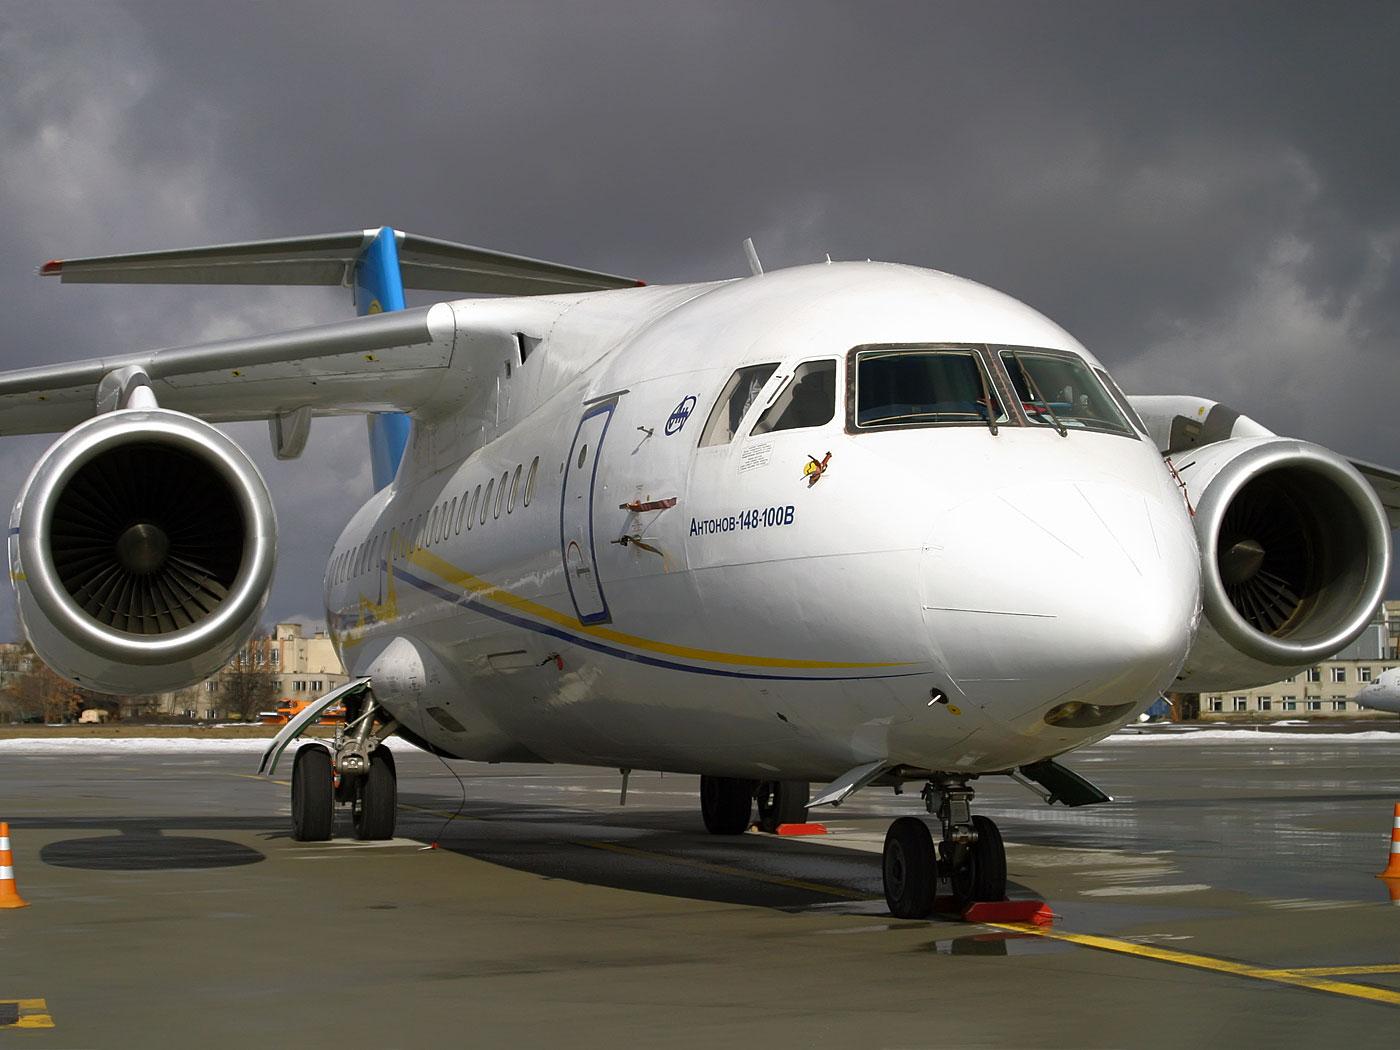 ur-ntc-ukraine-international-airlines-antonov-an-148-